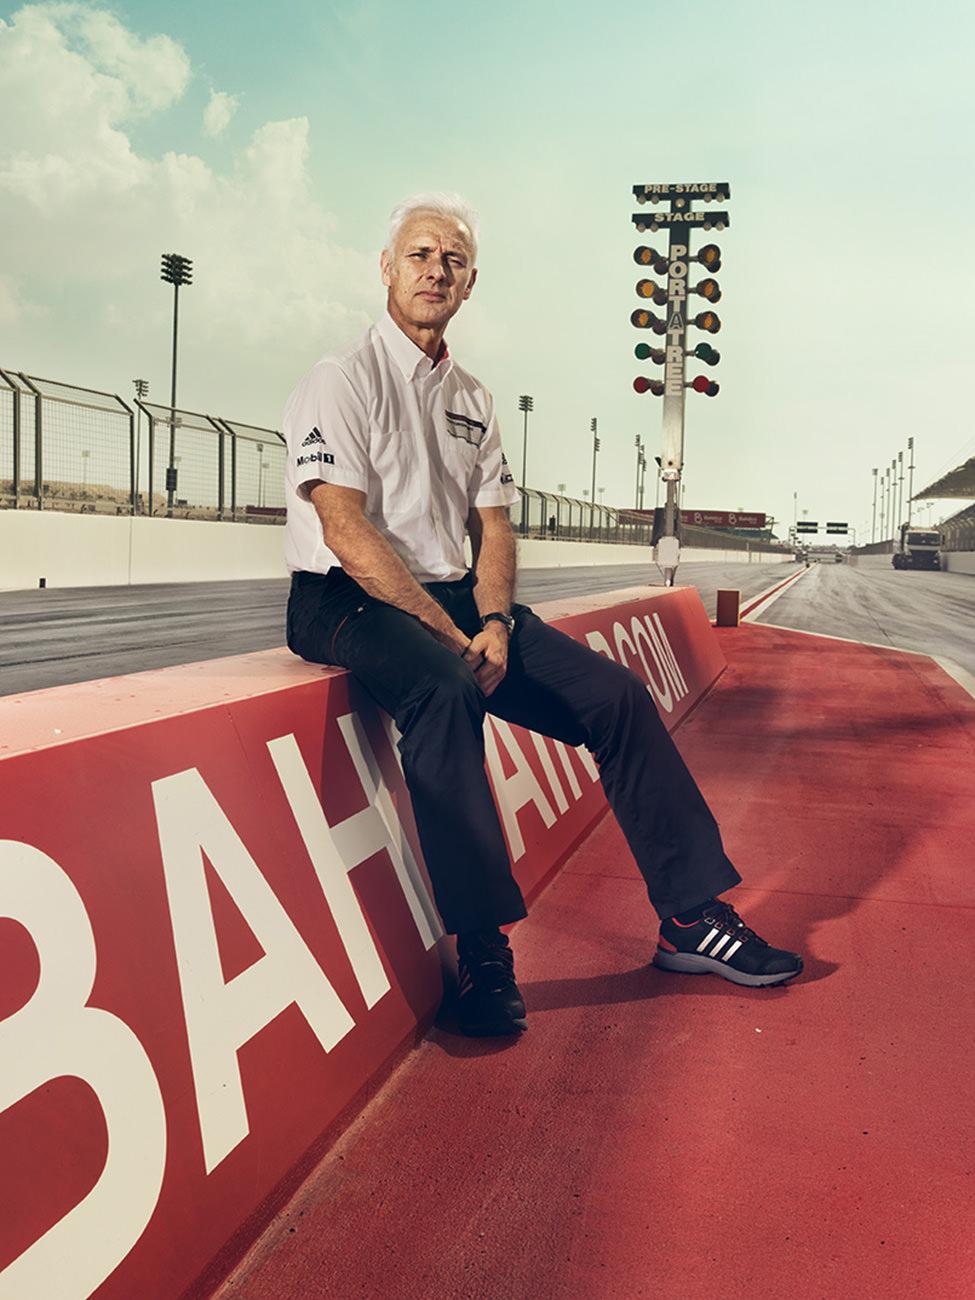 ©ankeluckmann1435v,Bahrain; Circuit; GQ; Pit lane; Porsche; Race Track; Transportation; WEC; 6 hours Bahrain; Portrait; Matthias Mueller; CEO, anke luckmann, www.ankeluckmann.com, kai tietz, racing